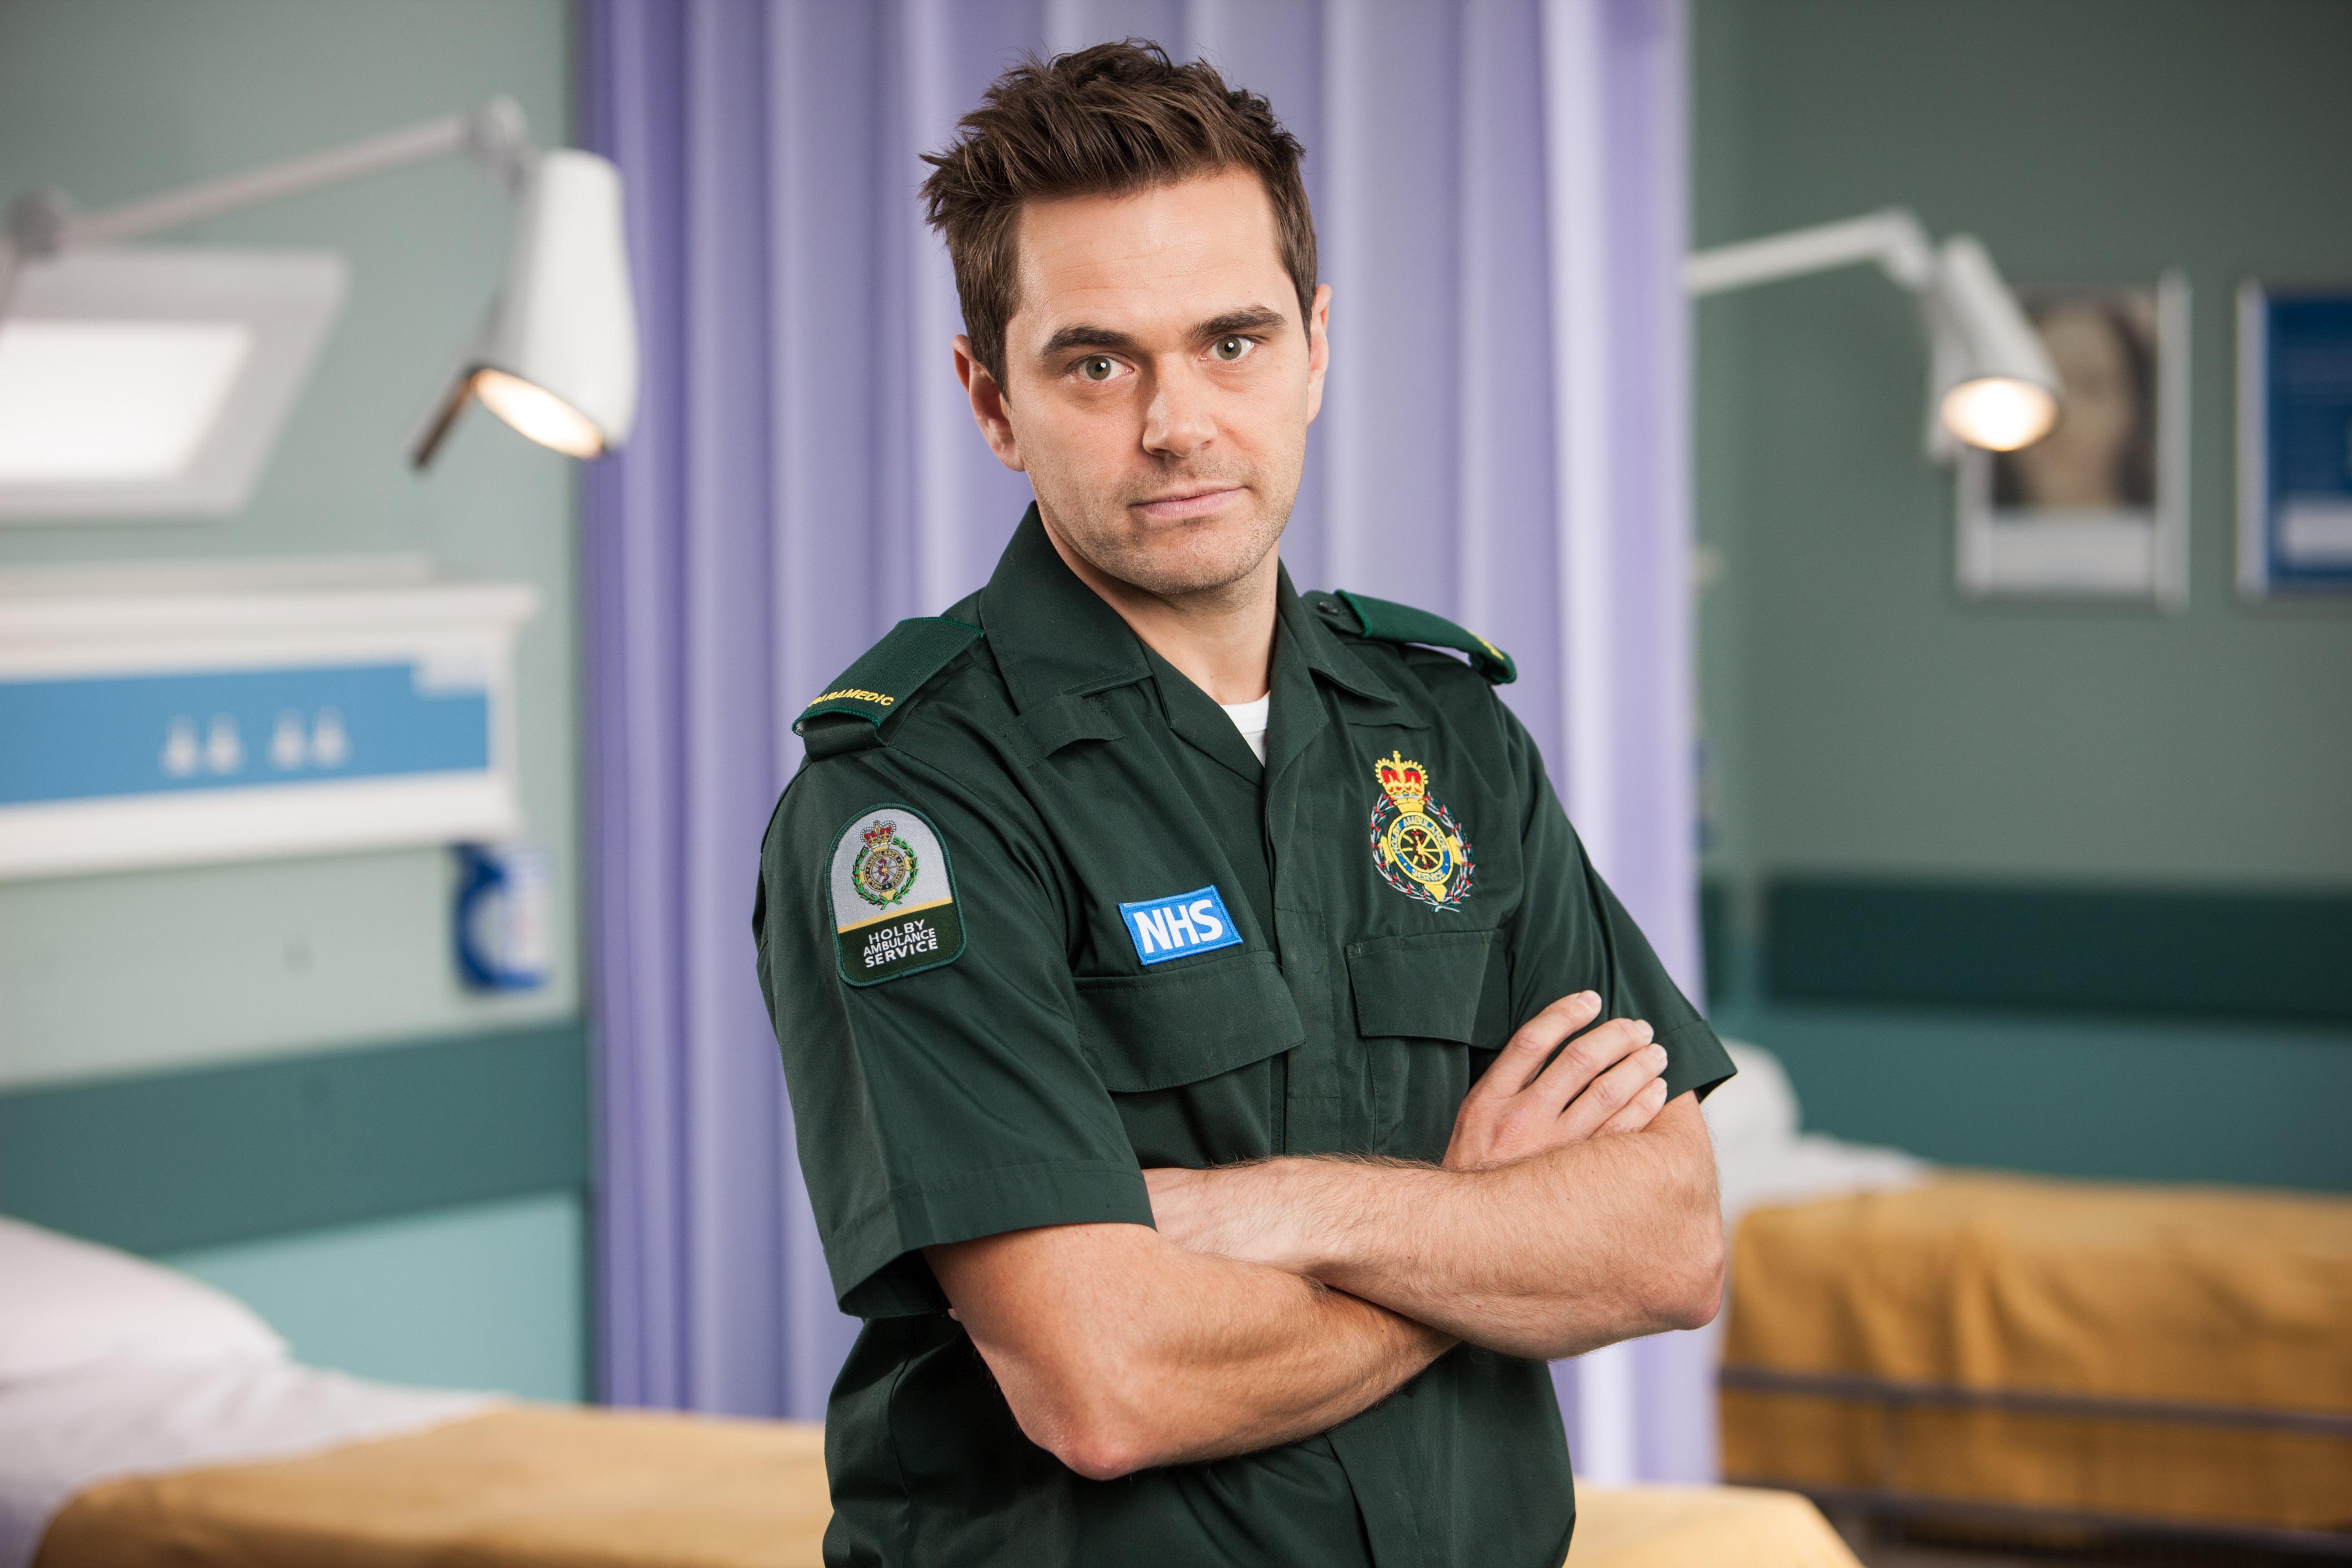 Programme Name: Casualty - Portraits - TX: n/a - Episode: Casualty - Portraits (No. n/a) - Picture Shows: Iain Dean (MICHAEL STEVENSON) - (C) BBC - Photographer: Jay Brooks